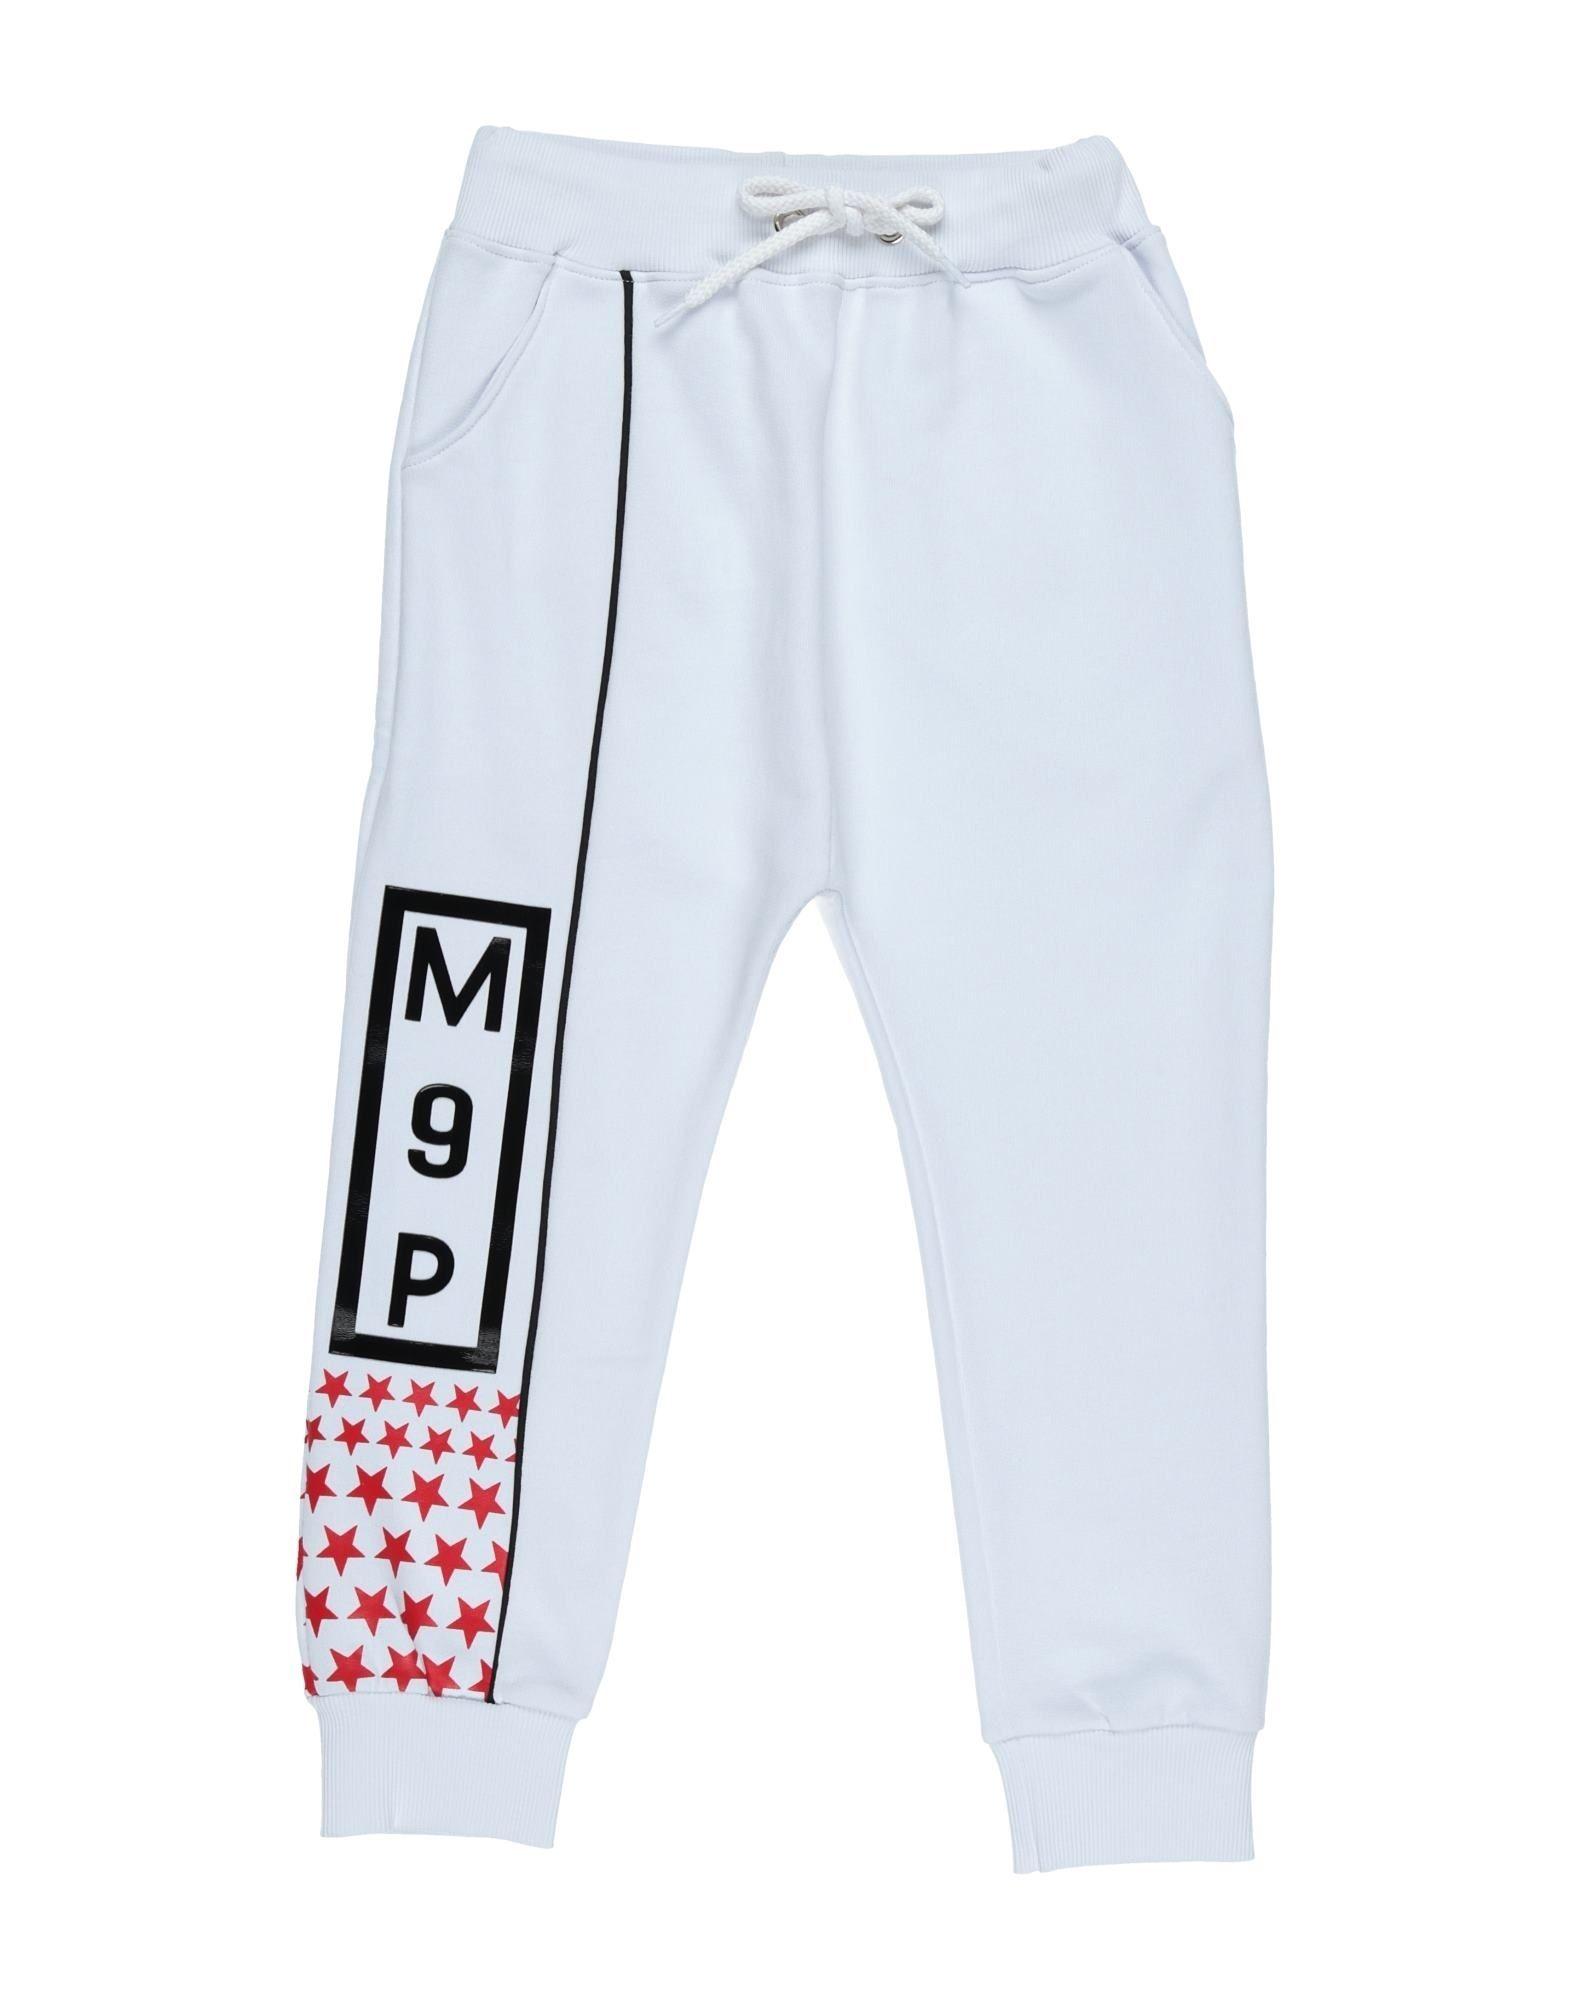 Maison 9 Paris Kids' Casual Pants In White